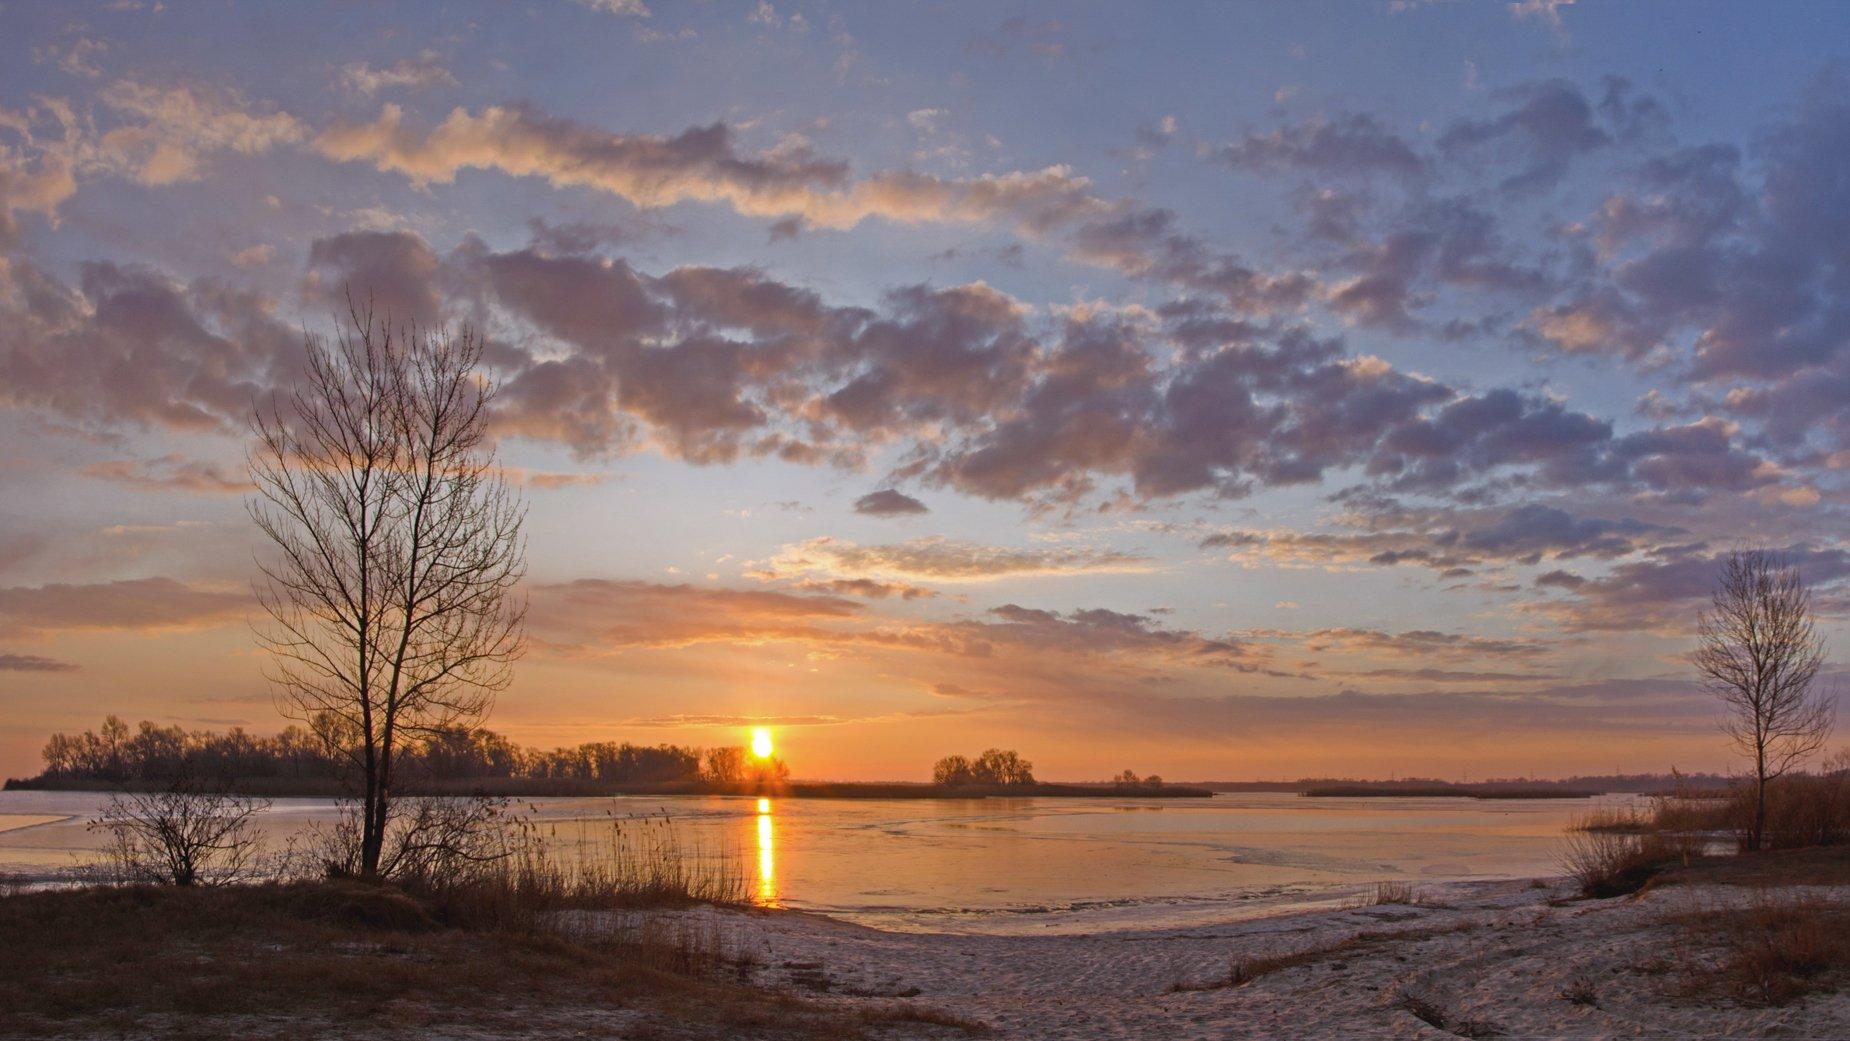 зима, утро, восход, река, лёд, проталины, Валерий Наумов